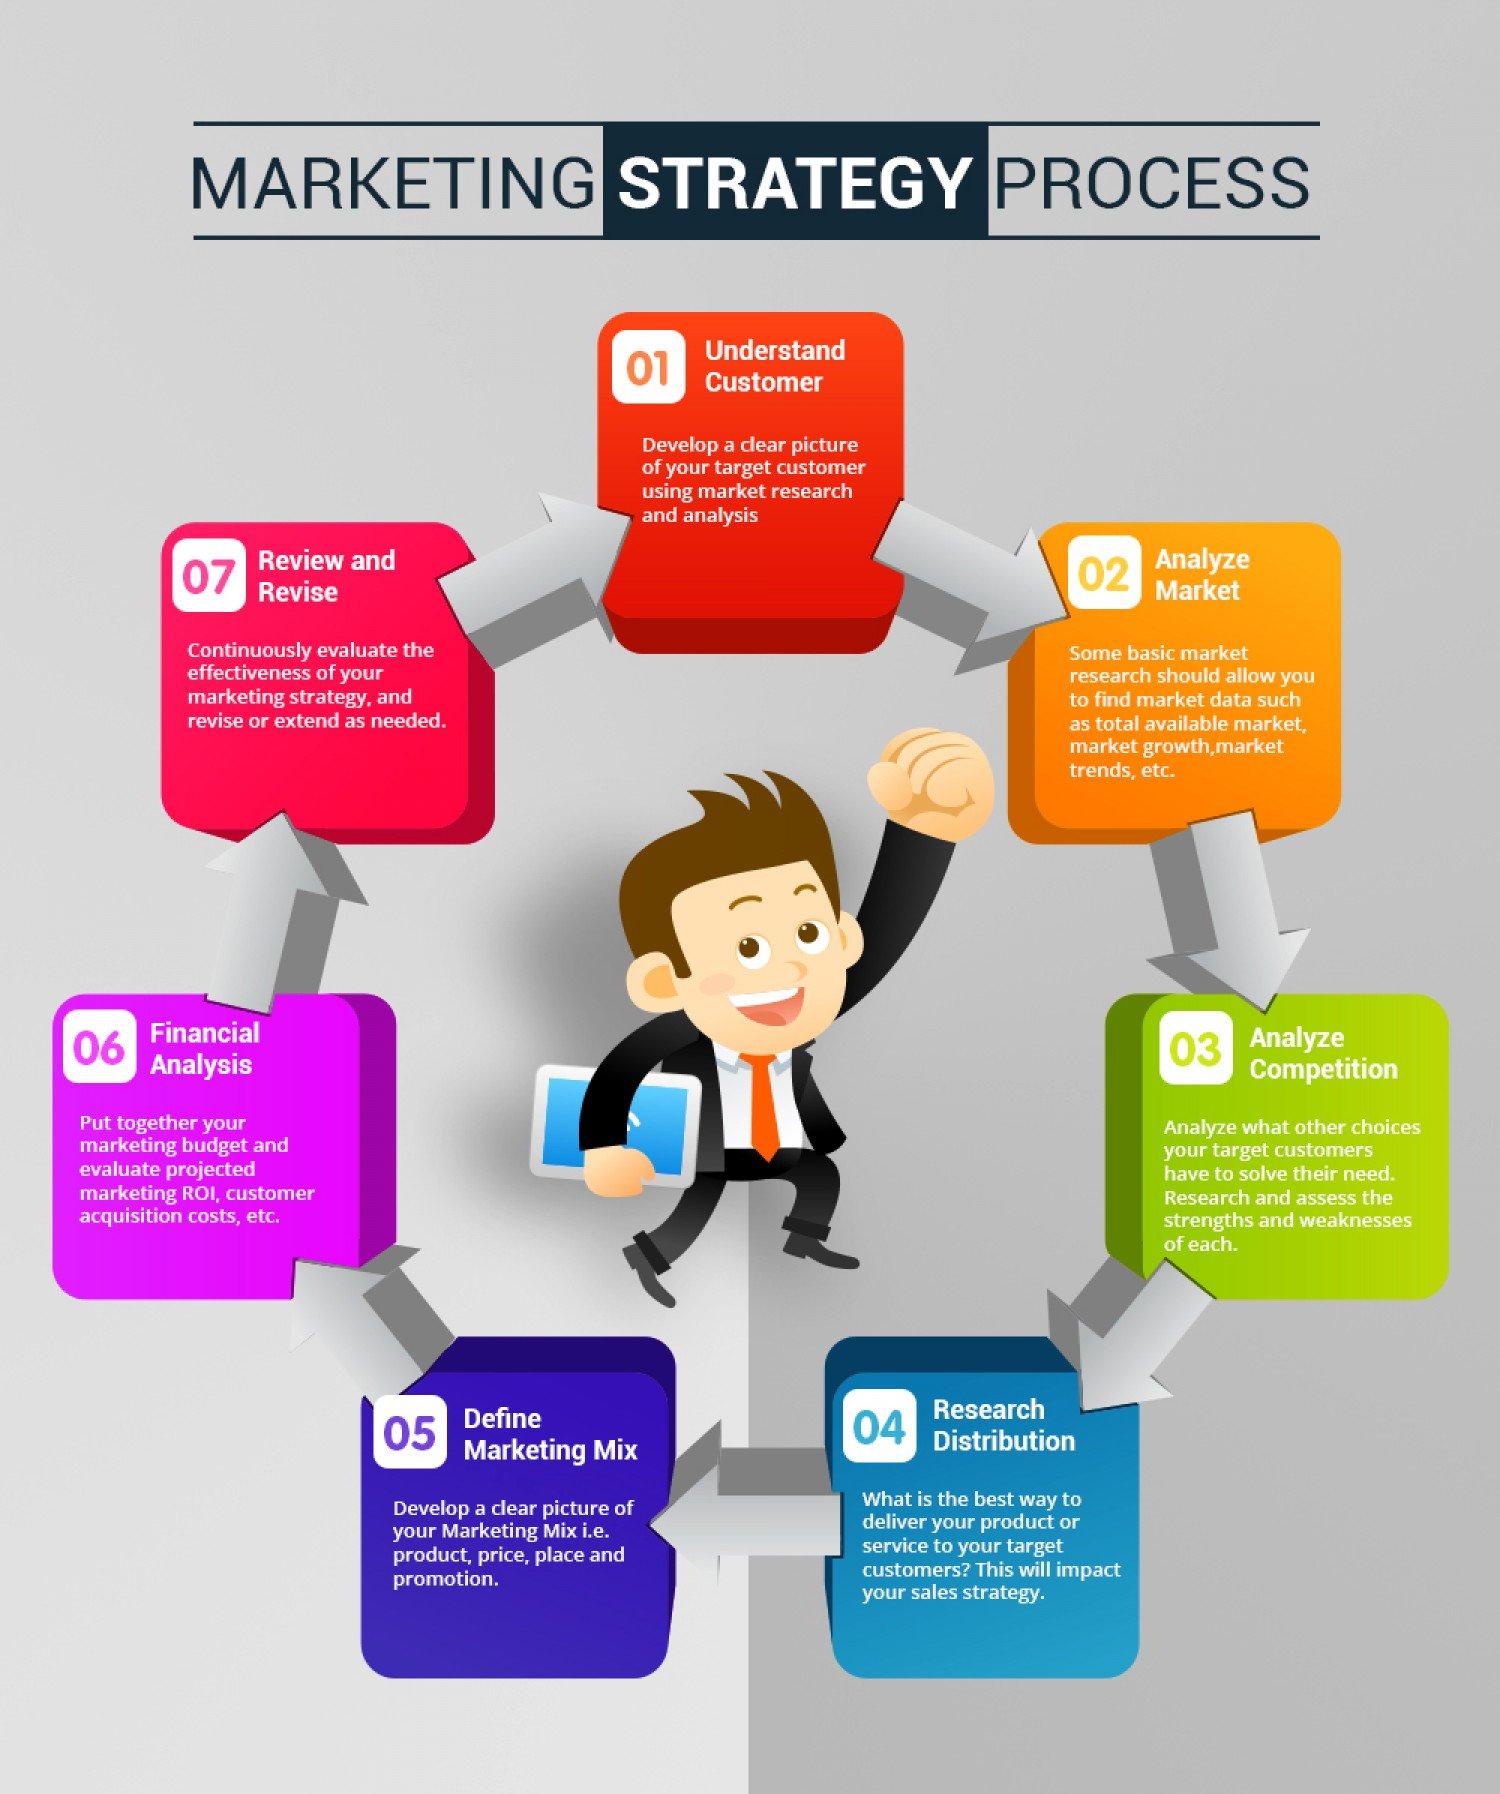 7 Great #Marketing #strategy❗  #Innovation #DigitalMarketing #Mpgvip #defstar5 #makeyourownlane #growthhacking #SEOp #socialmediap #Marketer https://t.co/opzAZfreit